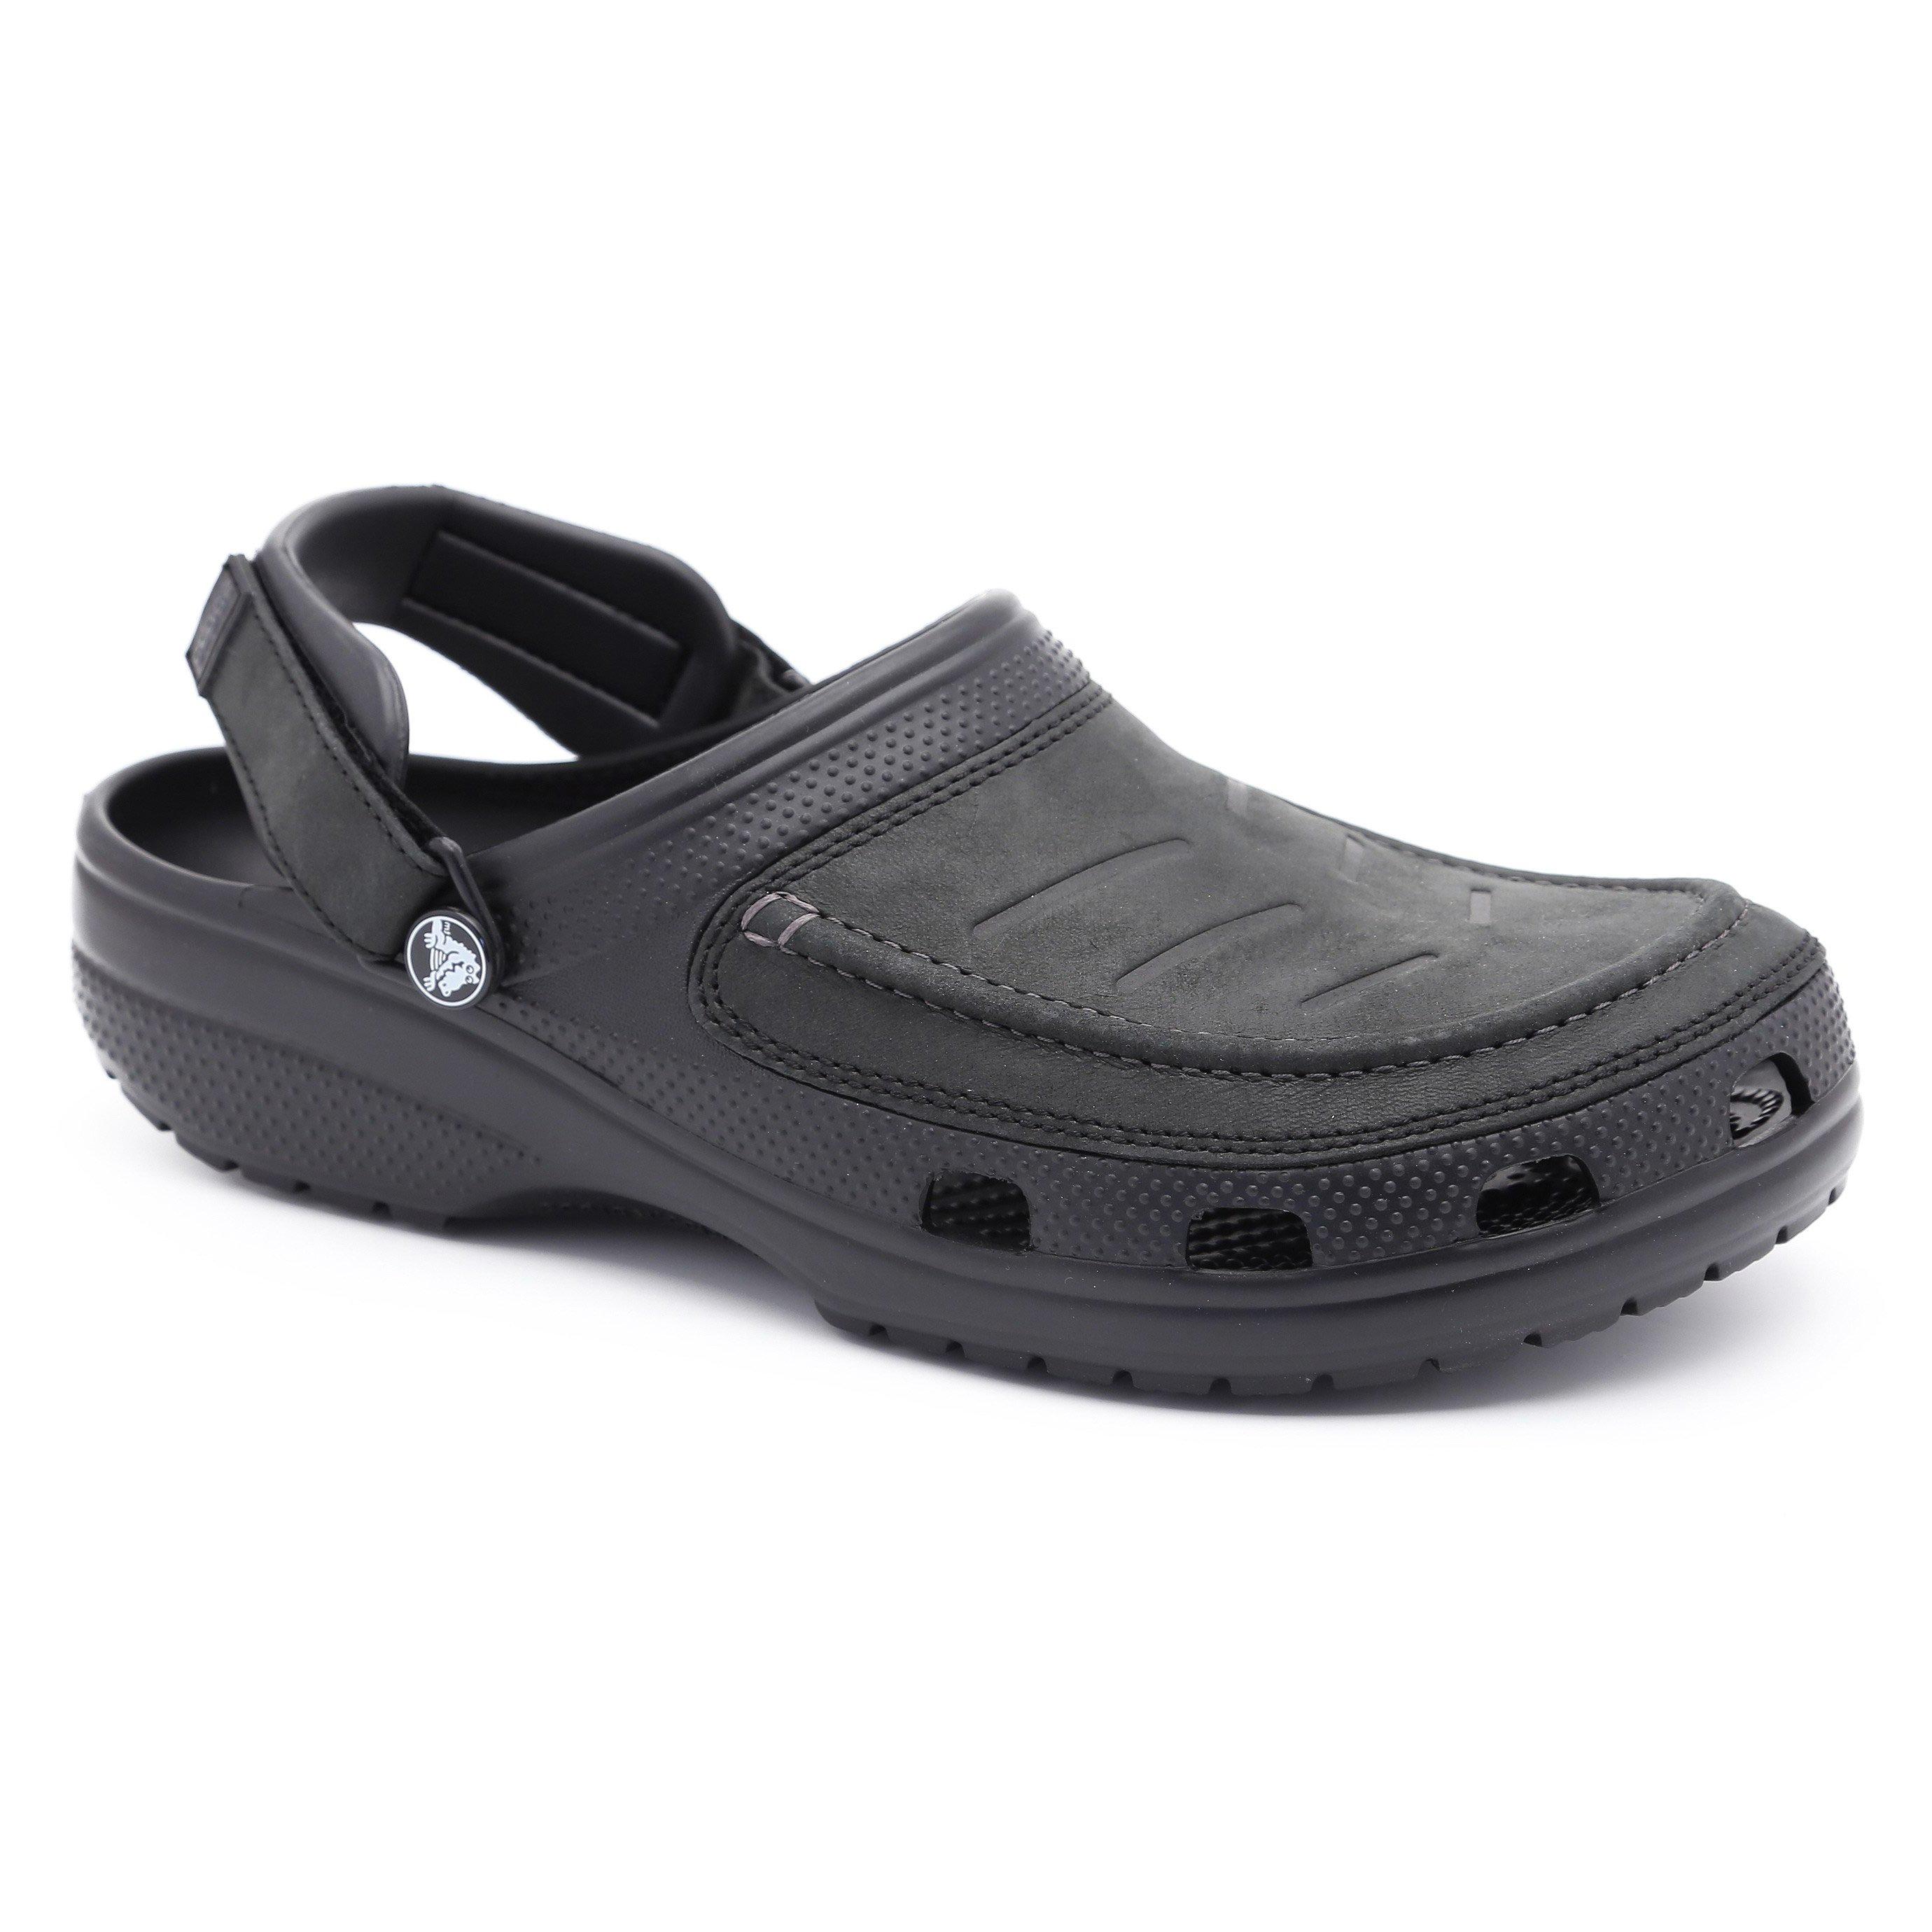 Crocs Yukon Vista Clog  - כפכף יוקון ויסטה לגבר בצבע שחור